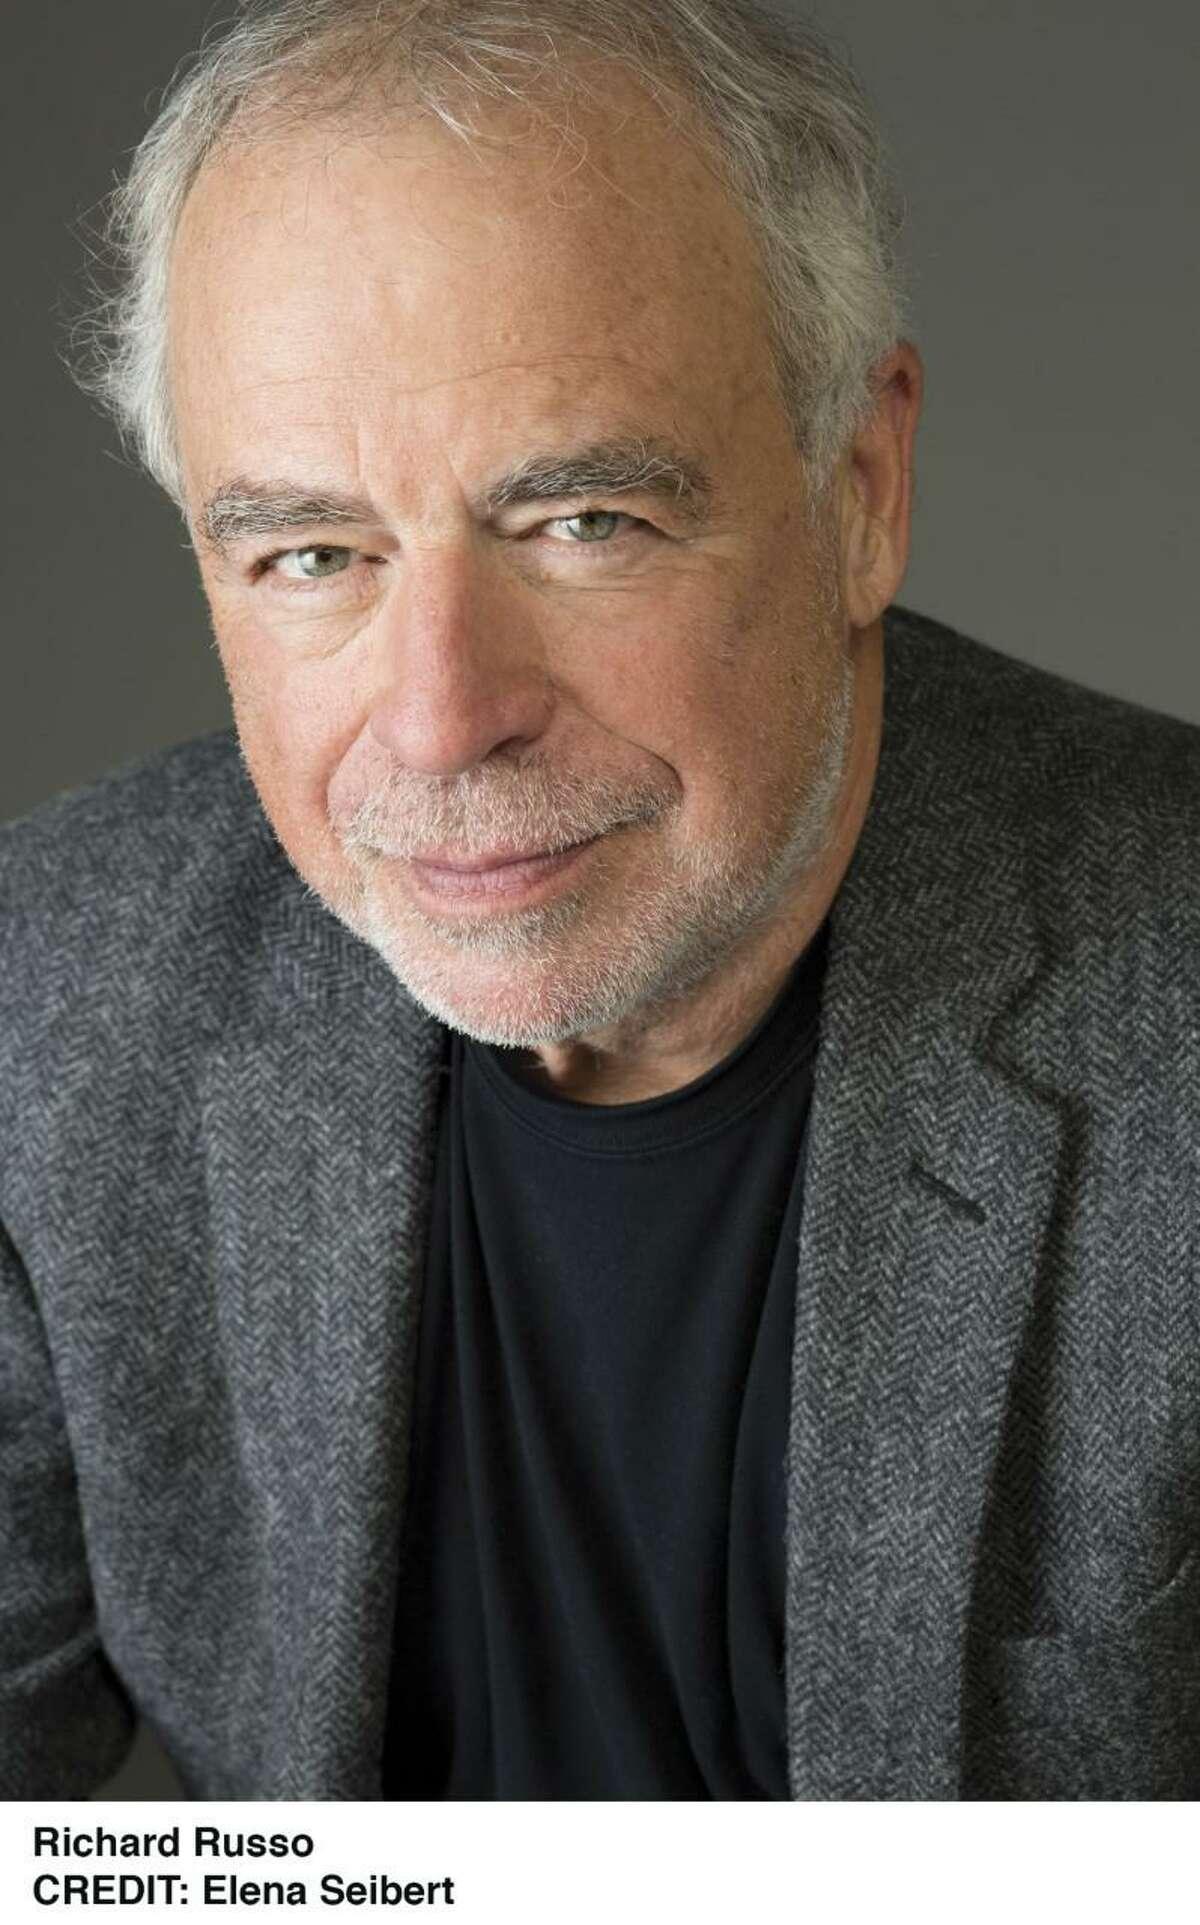 Author Richard Russo's